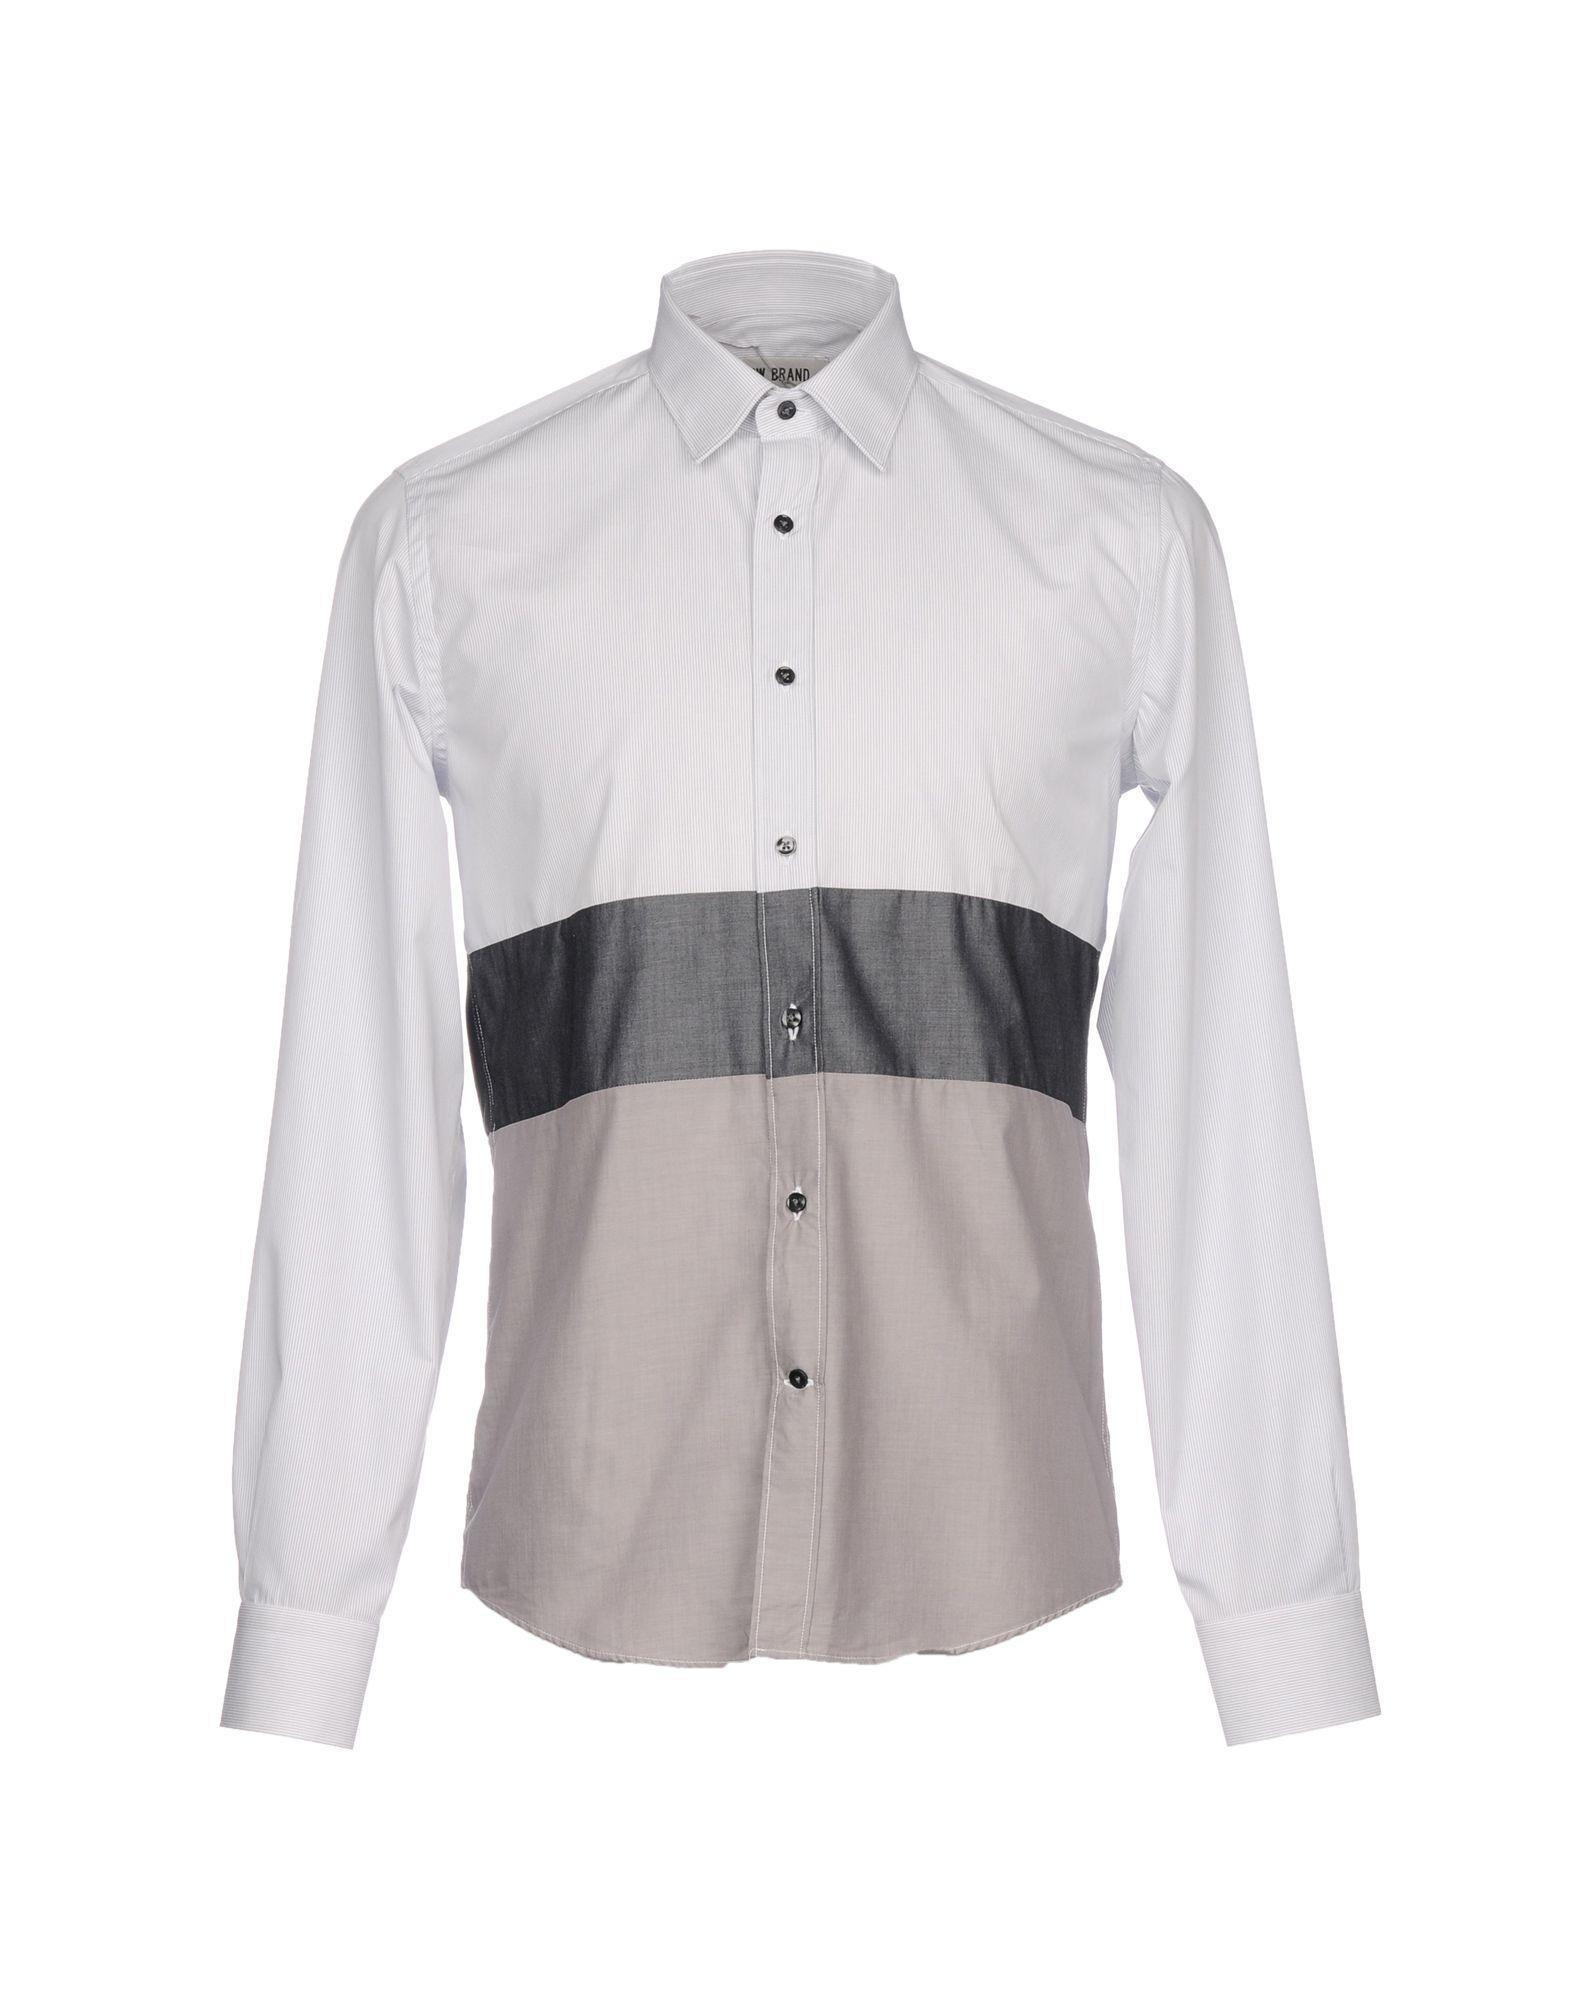 Low Brand Striped Shirt In Grey